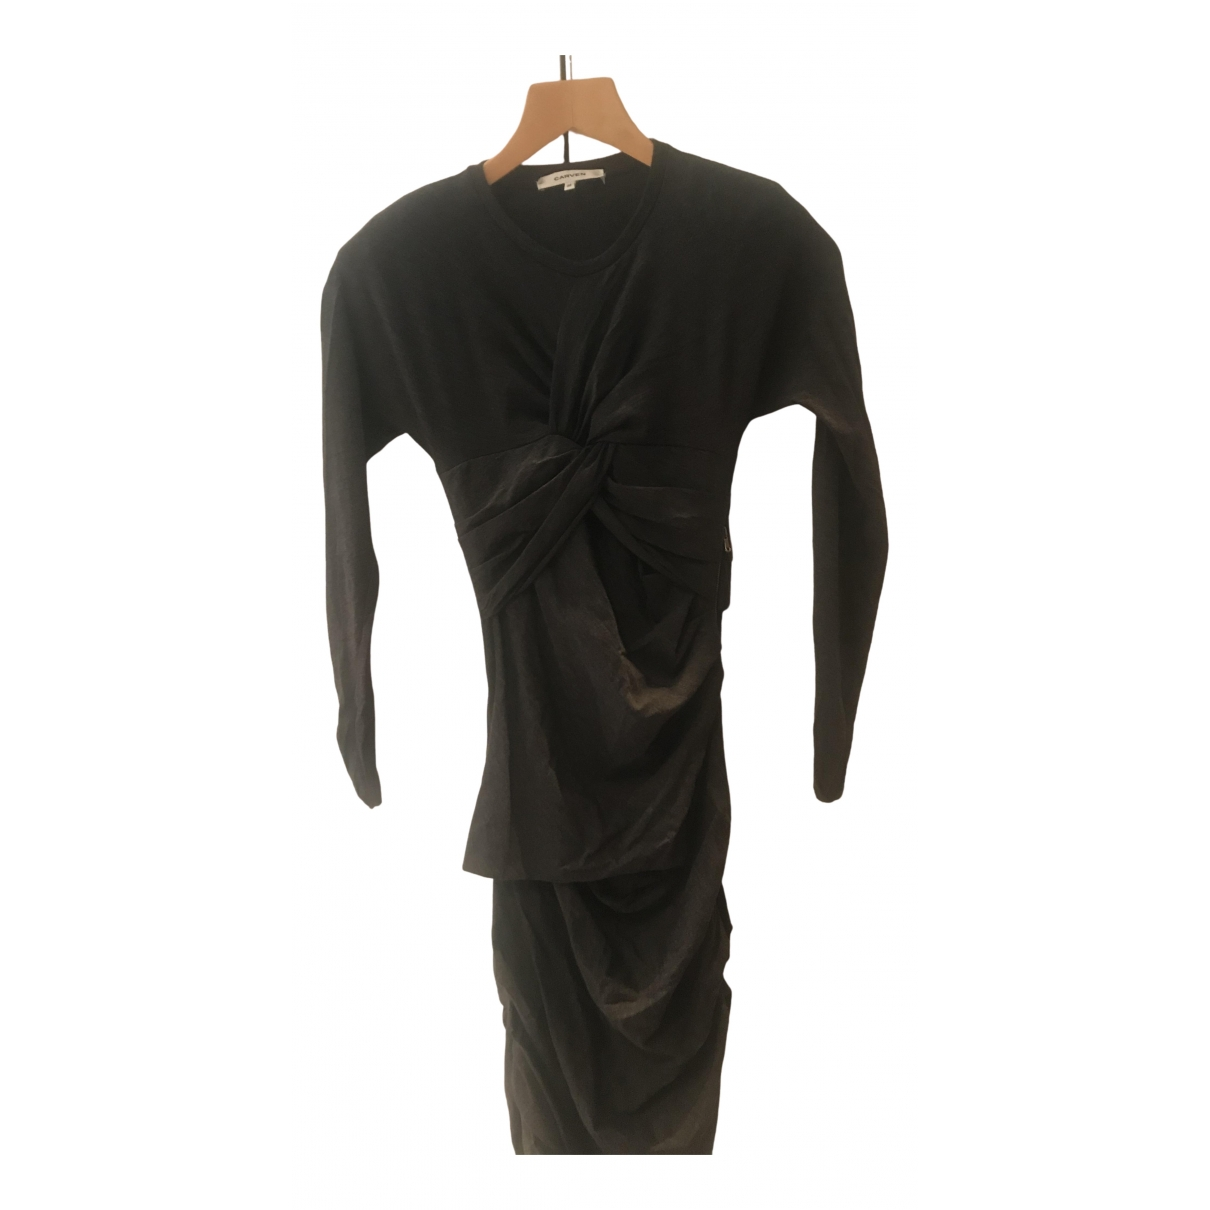 Carven \N Grey Wool dress for Women 38 FR